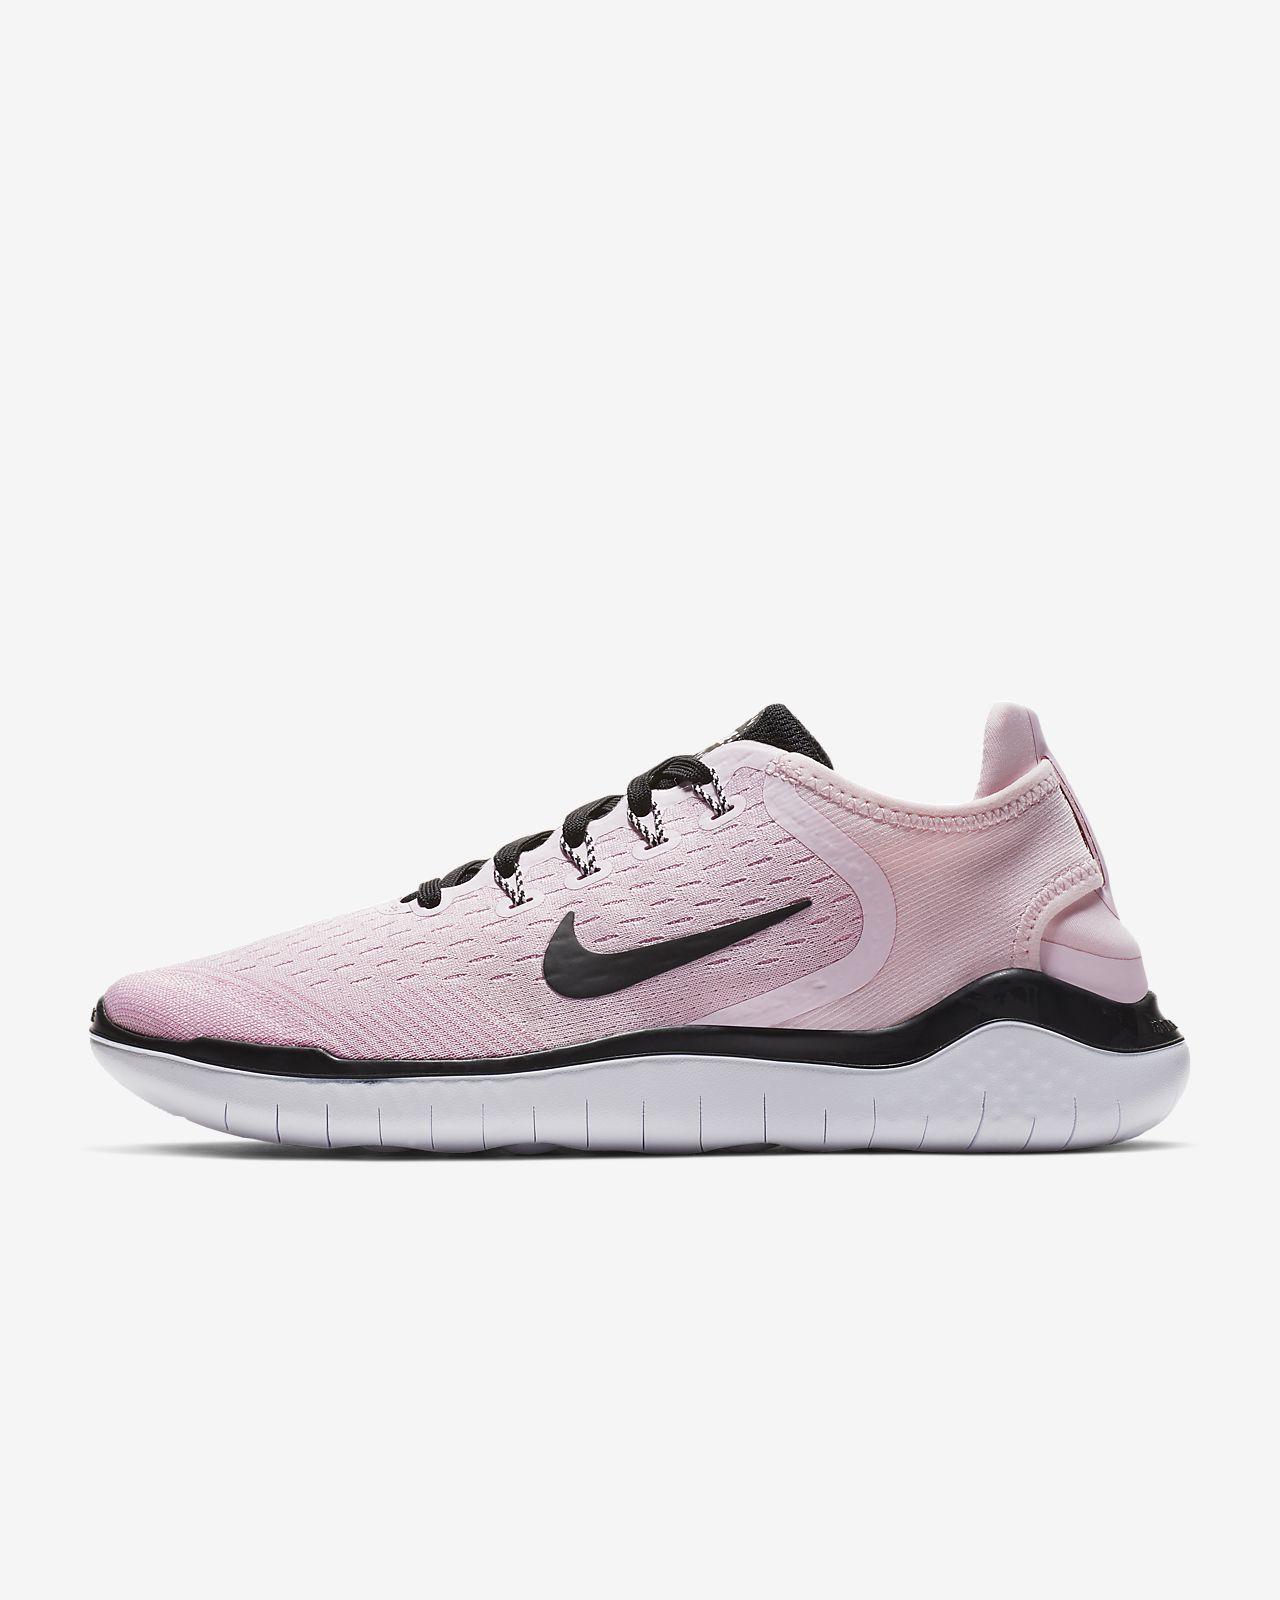 competitive price 1928d cb8f0 Nike 2018 Chaussure Pour Running De Free Rn Femme Ch EAq46qX